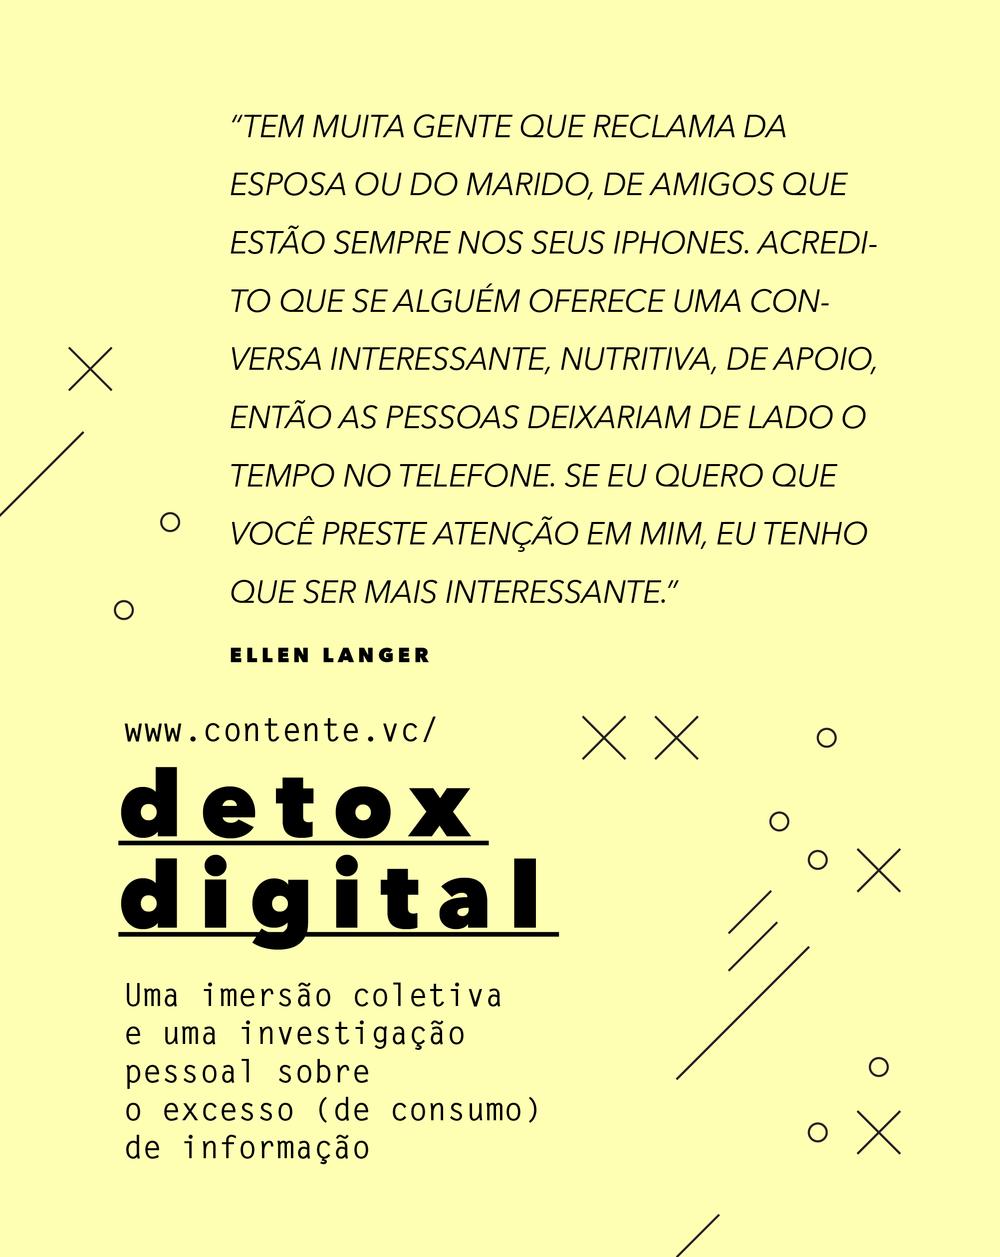 dettoxdigital-04.png